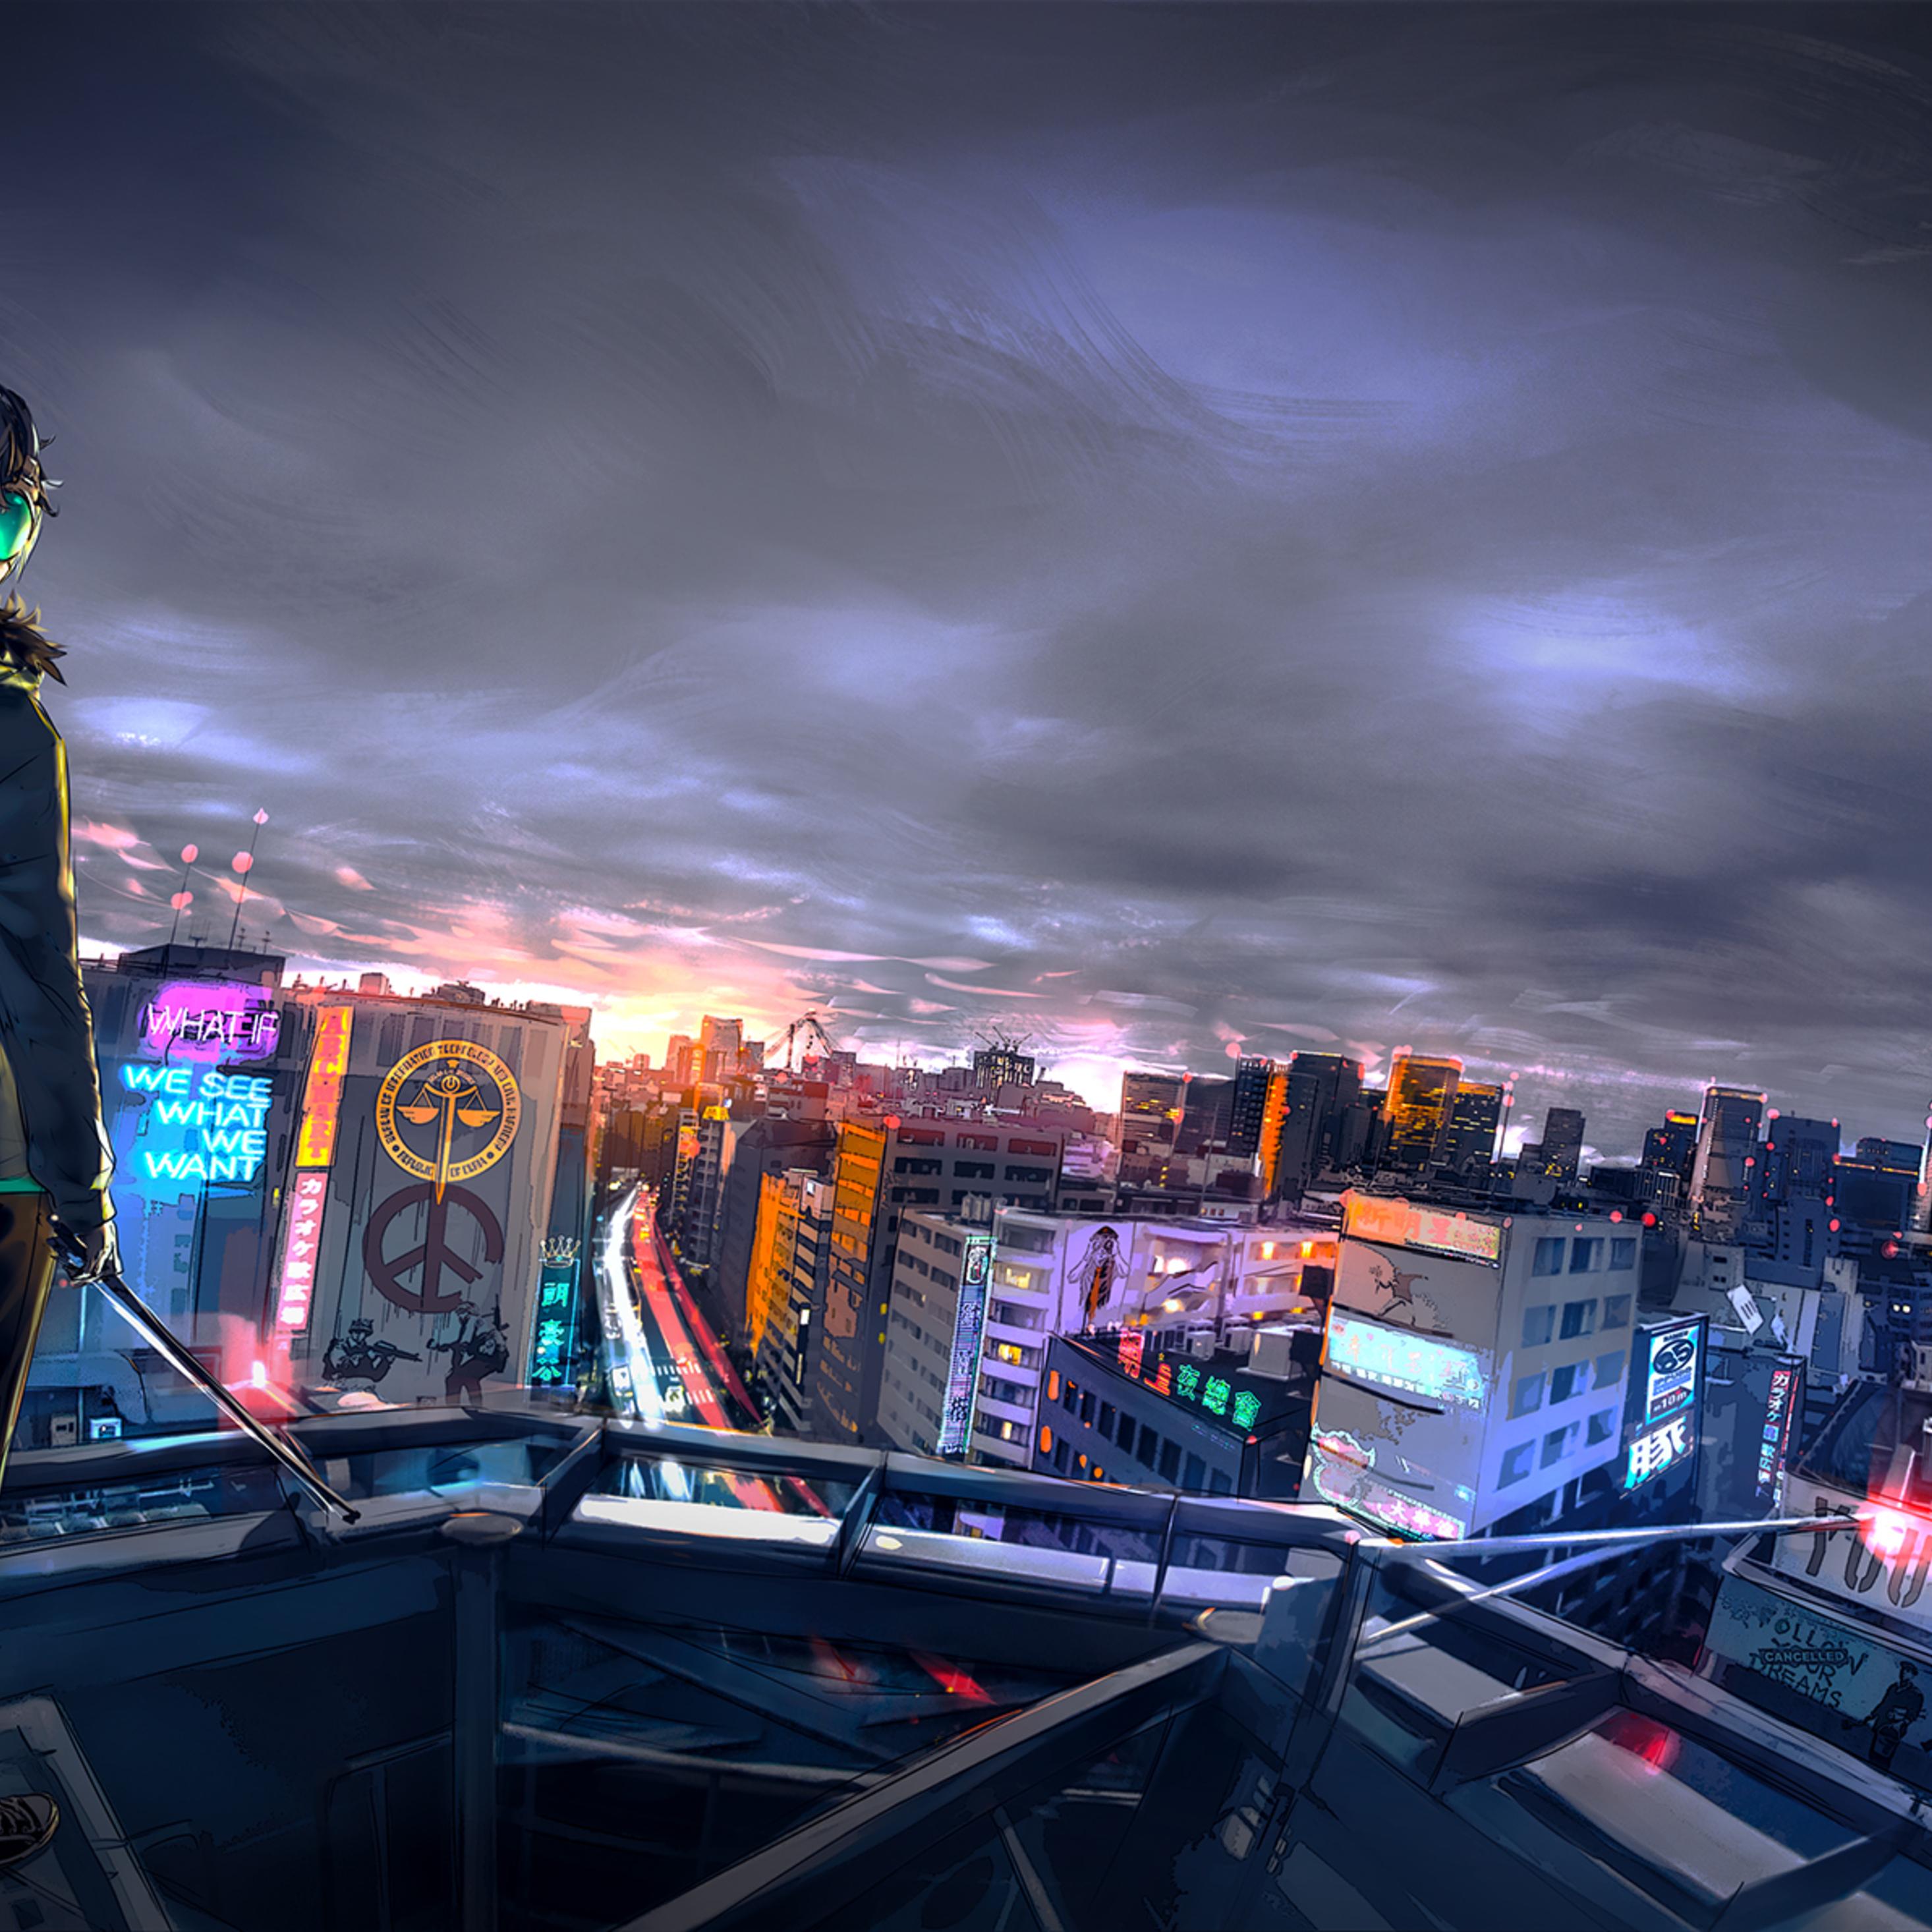 Cityscape Cyberpunk 2077 Wallpaper 4k